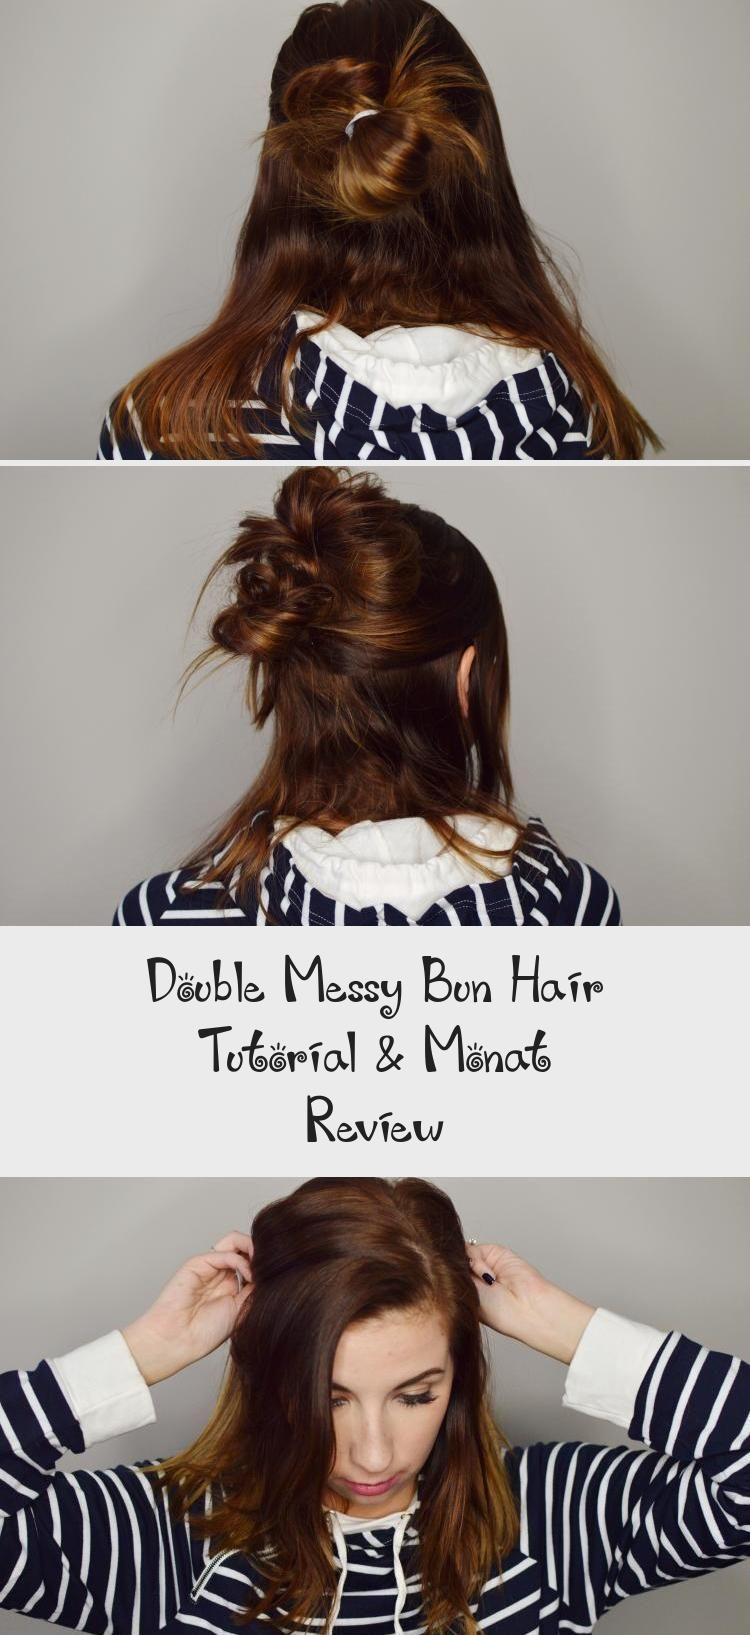 Double Messy Bun Hair Tutorial & Monat Review in 2020